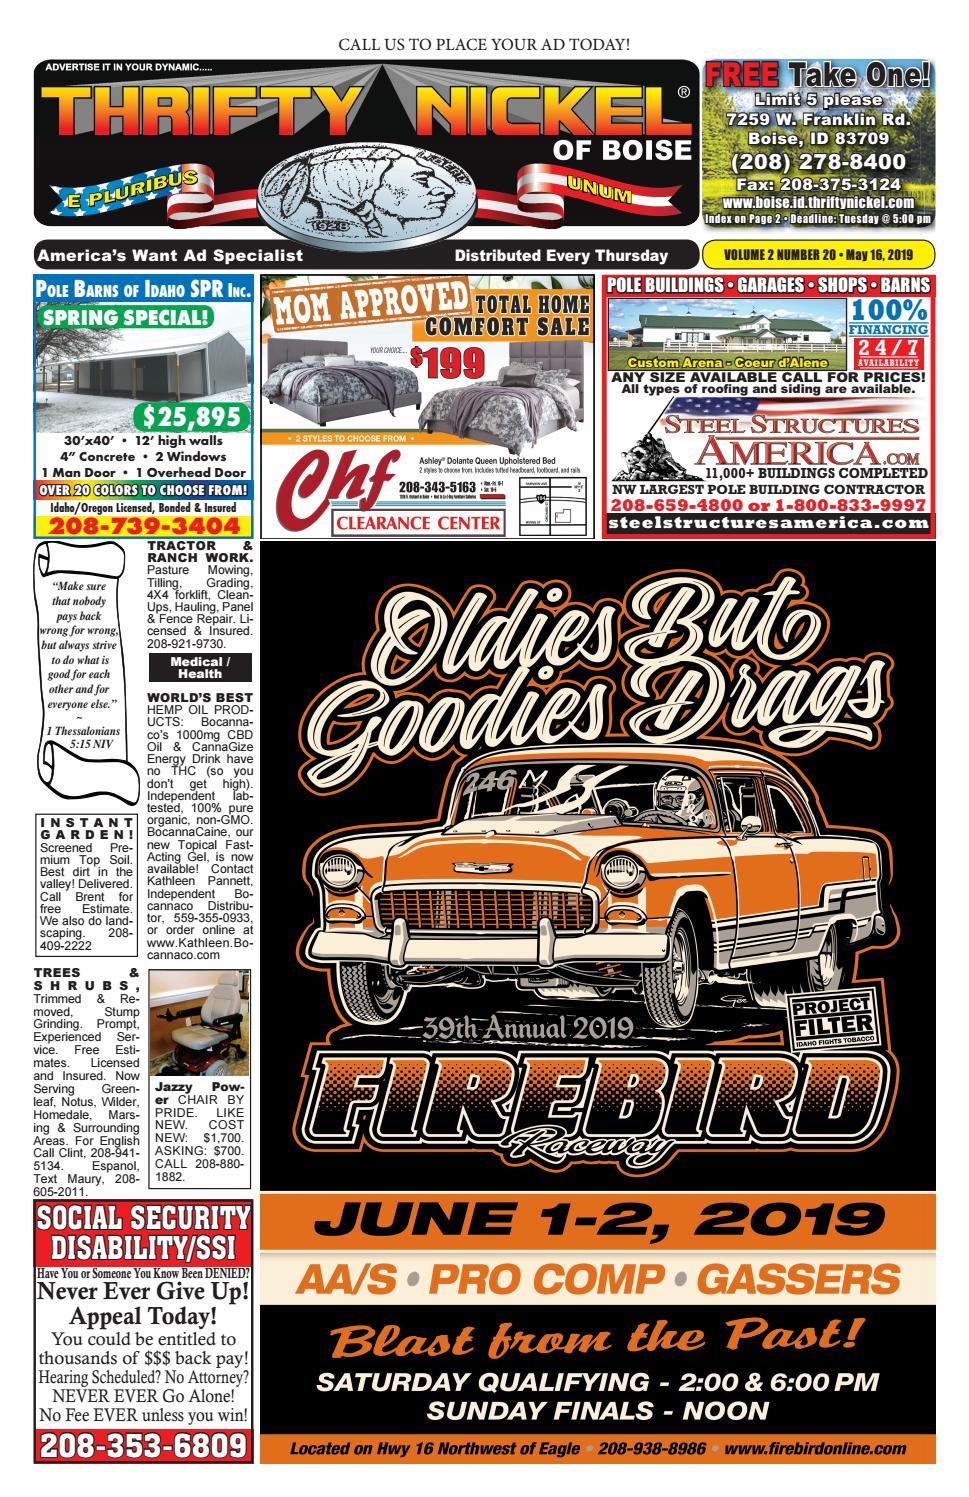 Thrifty Nickel Boise 5-16-2019 by tvdist - issuu